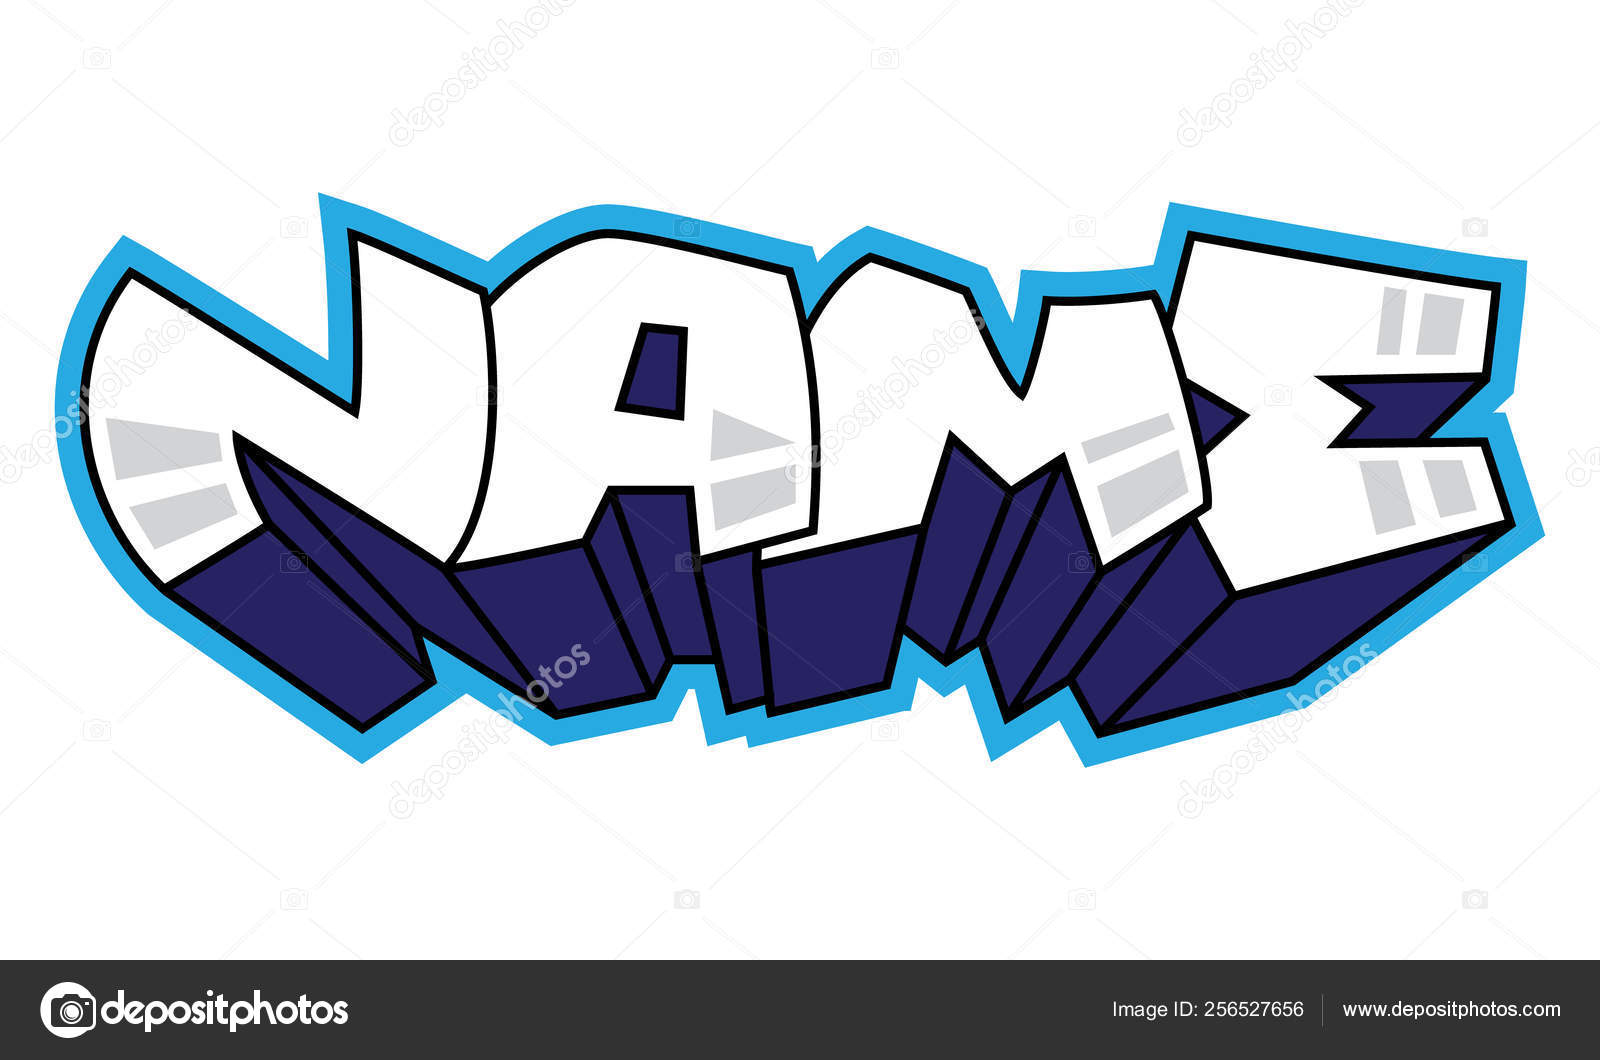 Graffiti. Name word. Street art spray paint graffiti sticker